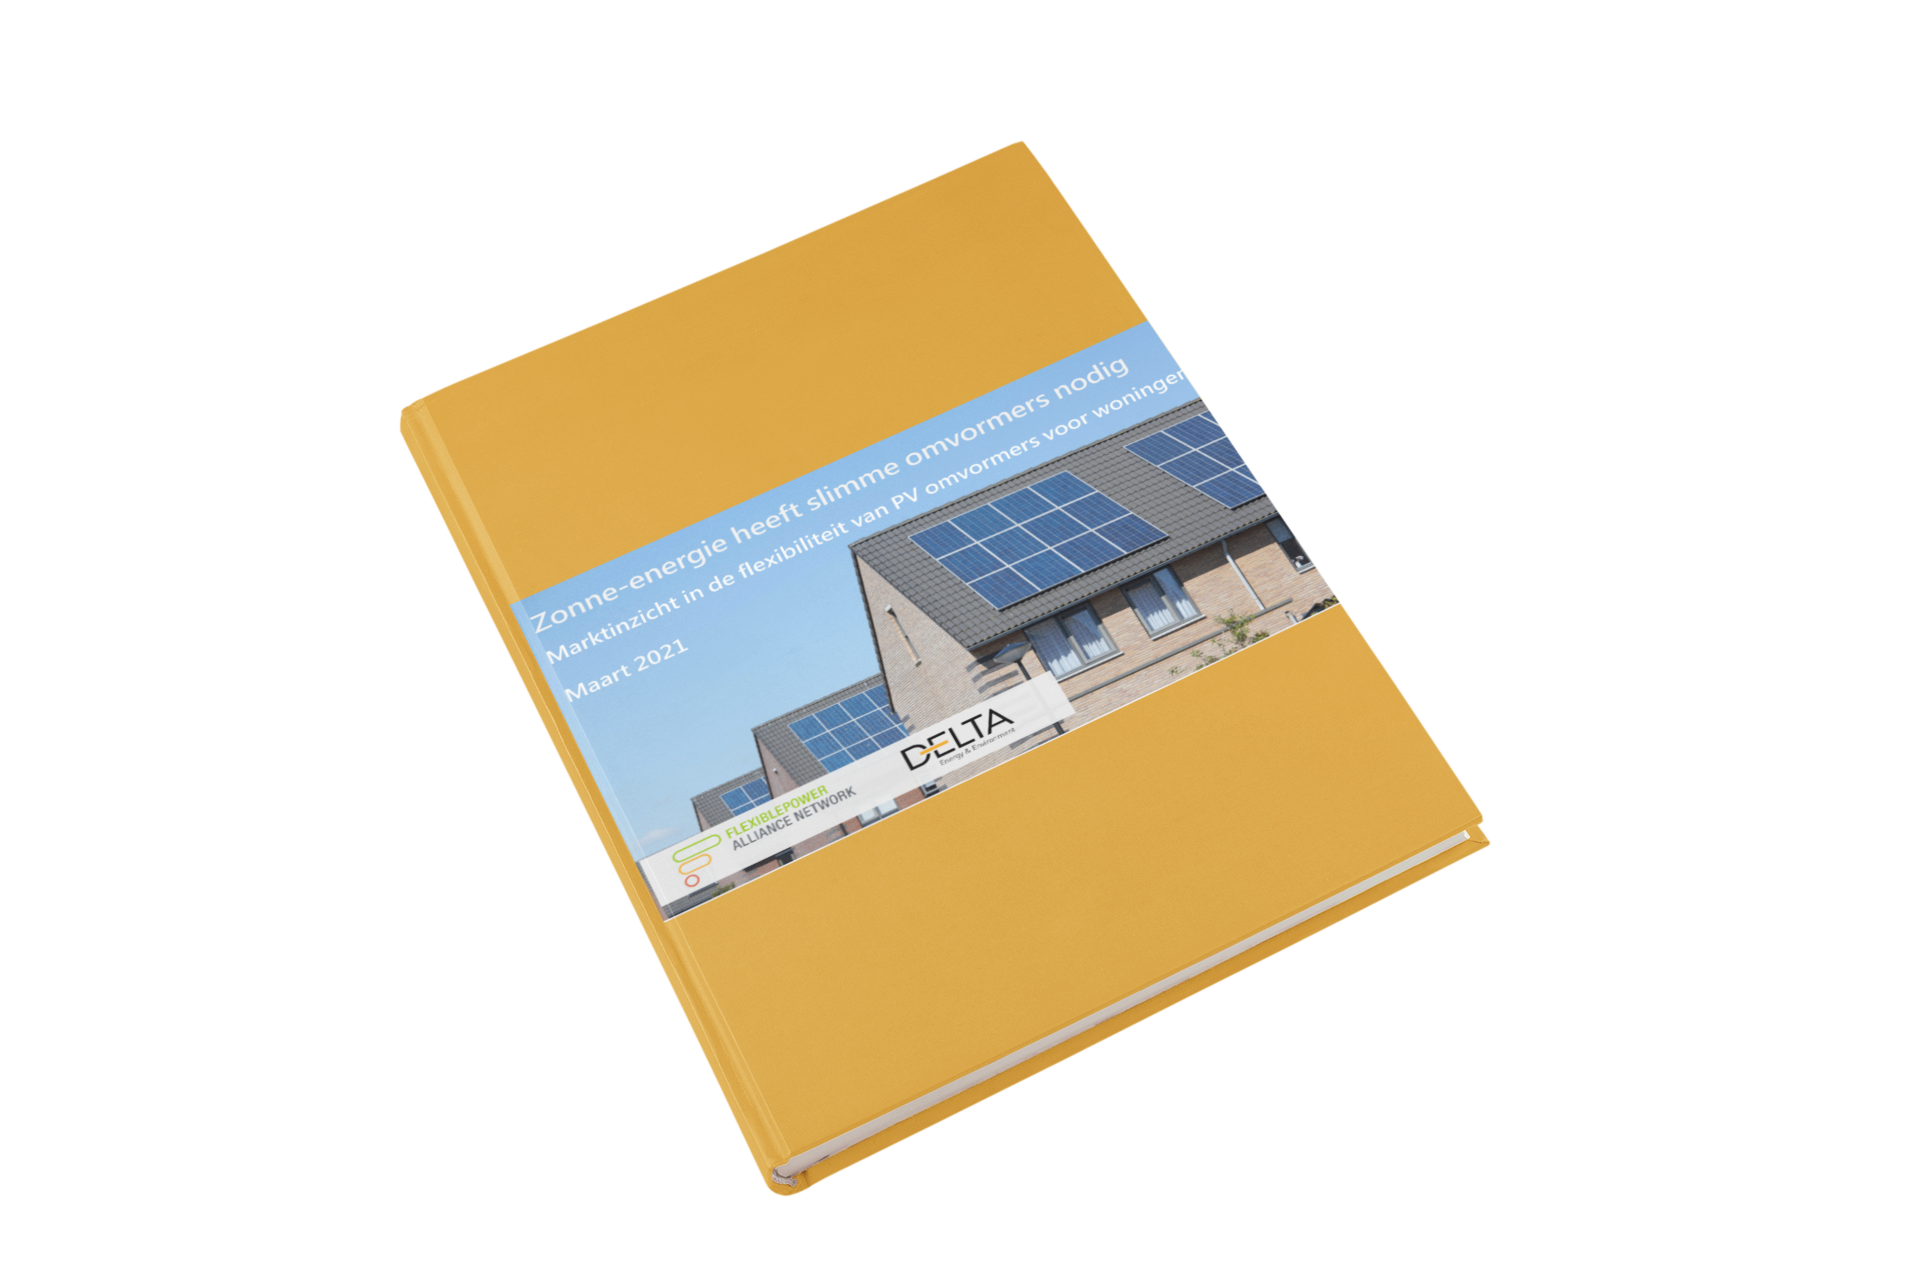 Samenvatting Flexmonitor: zonne-energie heeft slimme omvormers nodig